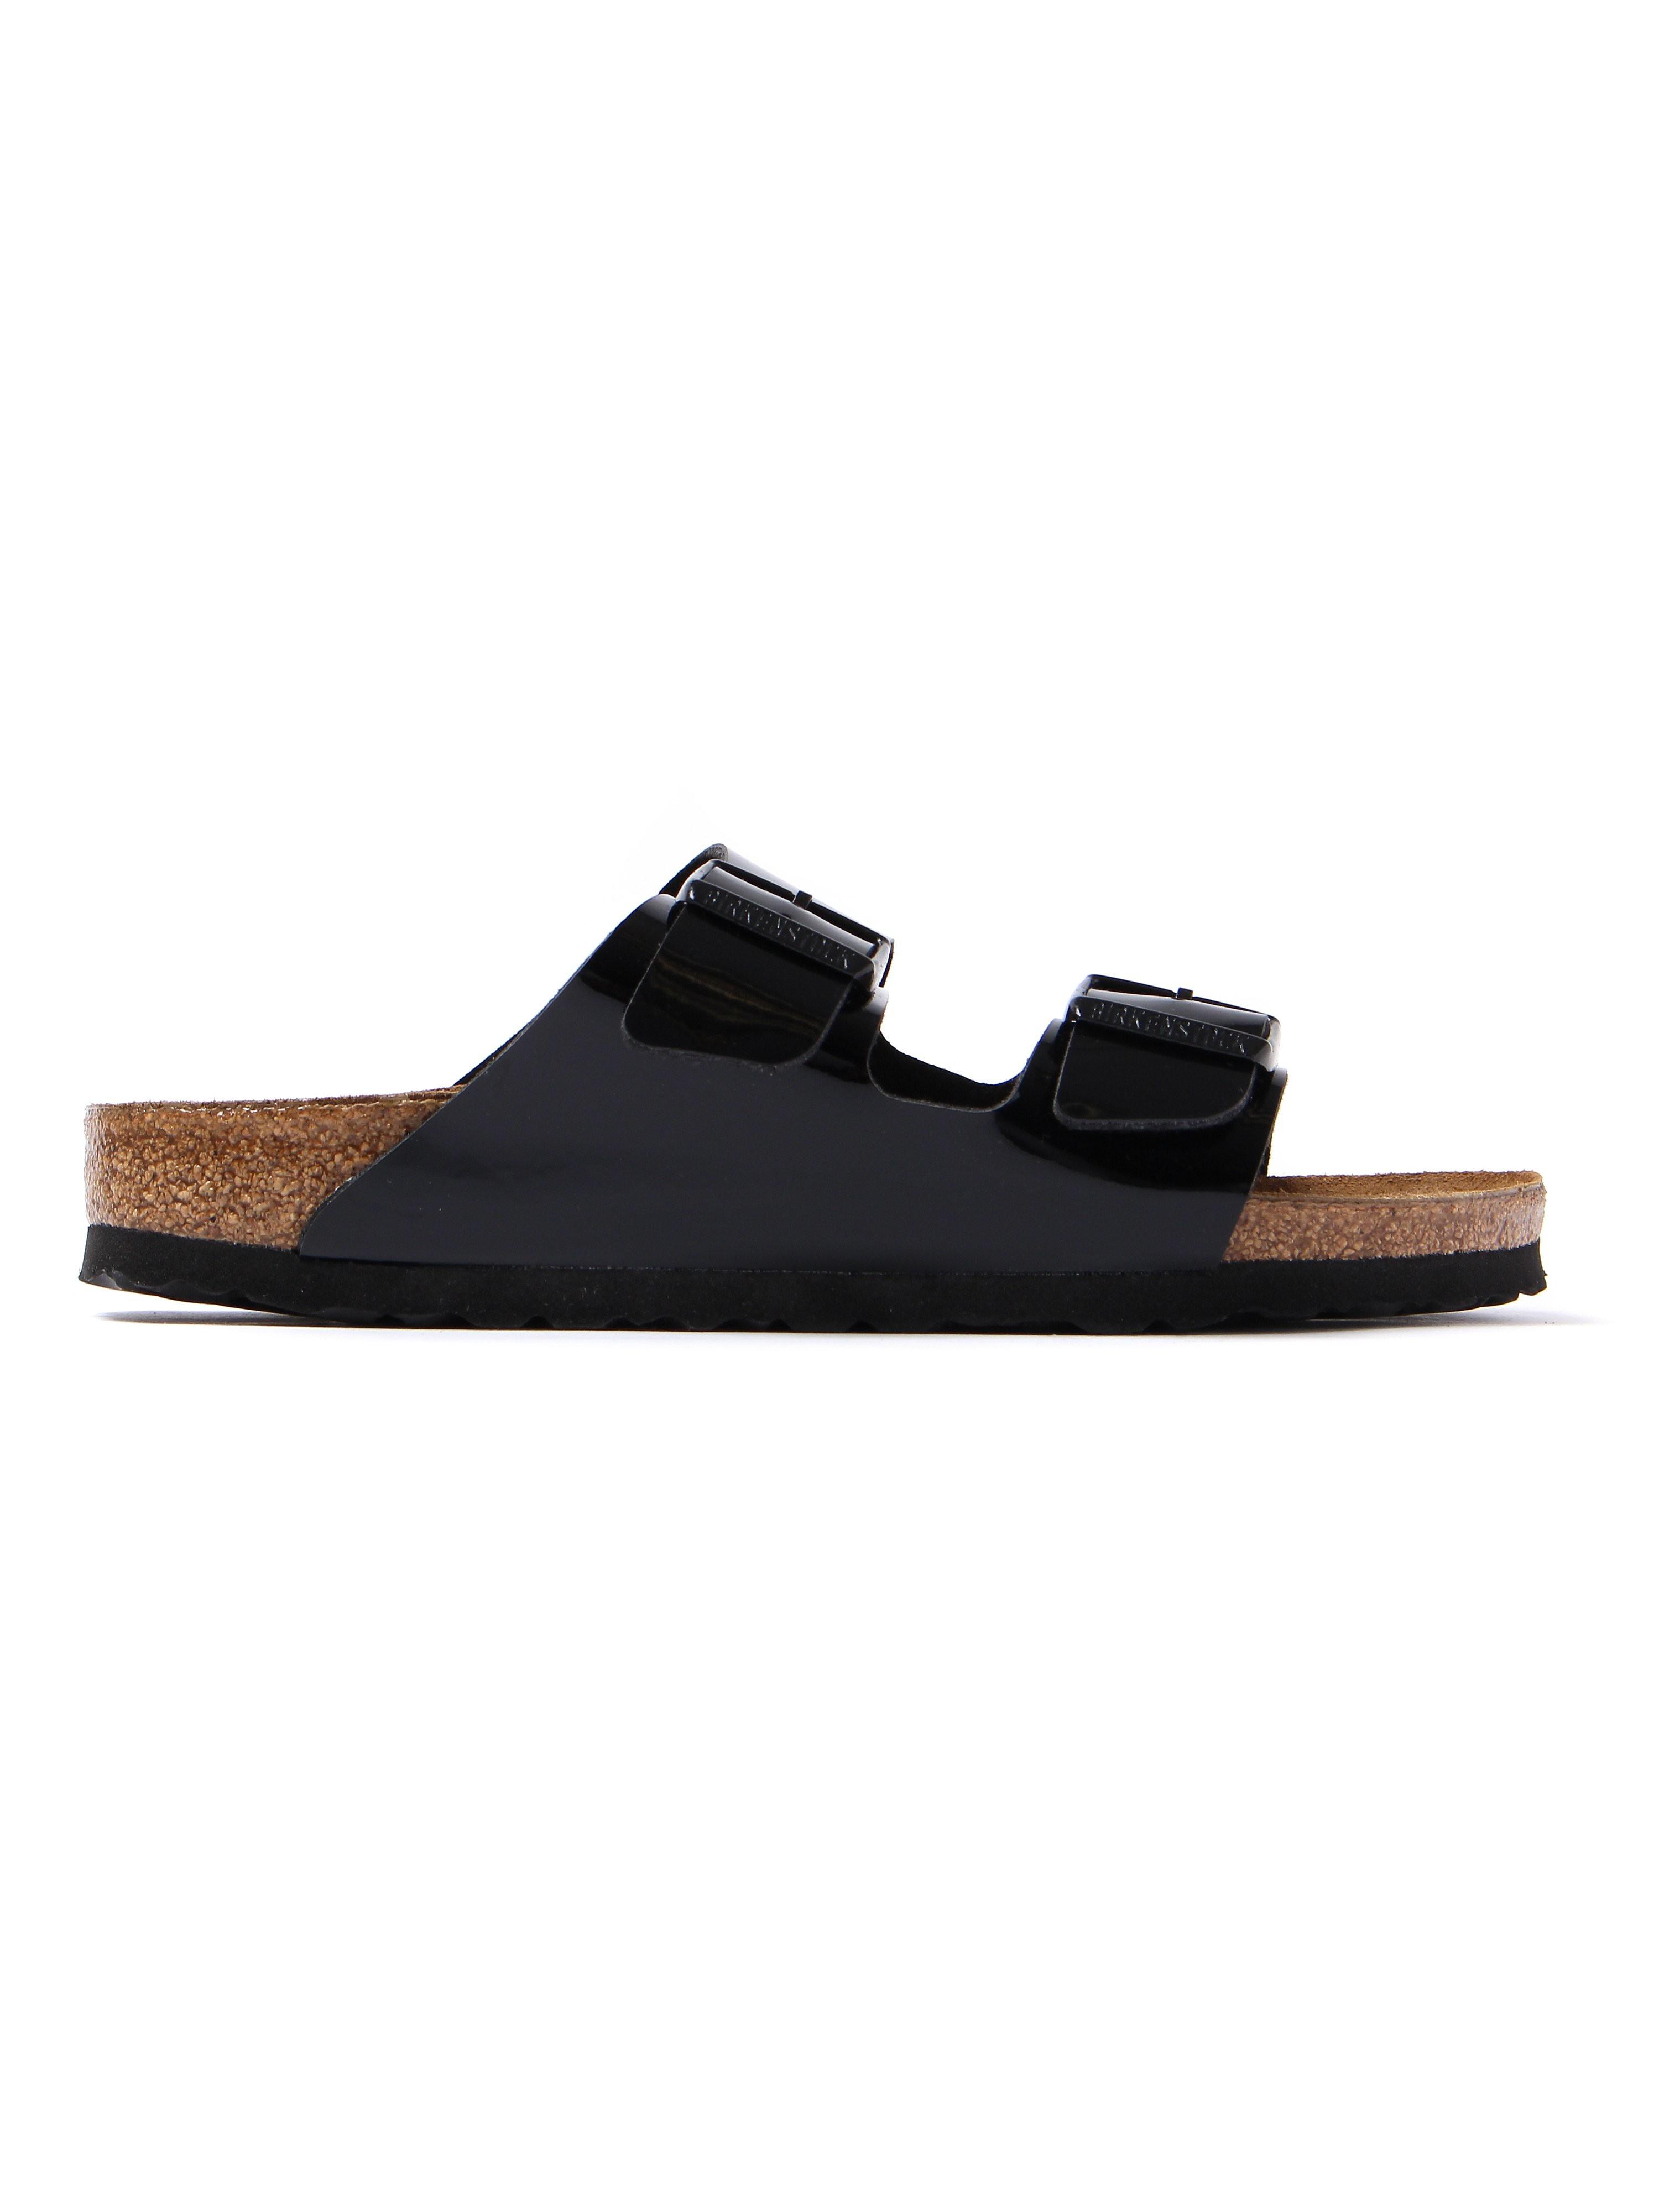 Birkenstock Women's Arizona Narrow Fit Sandals - Black Patent